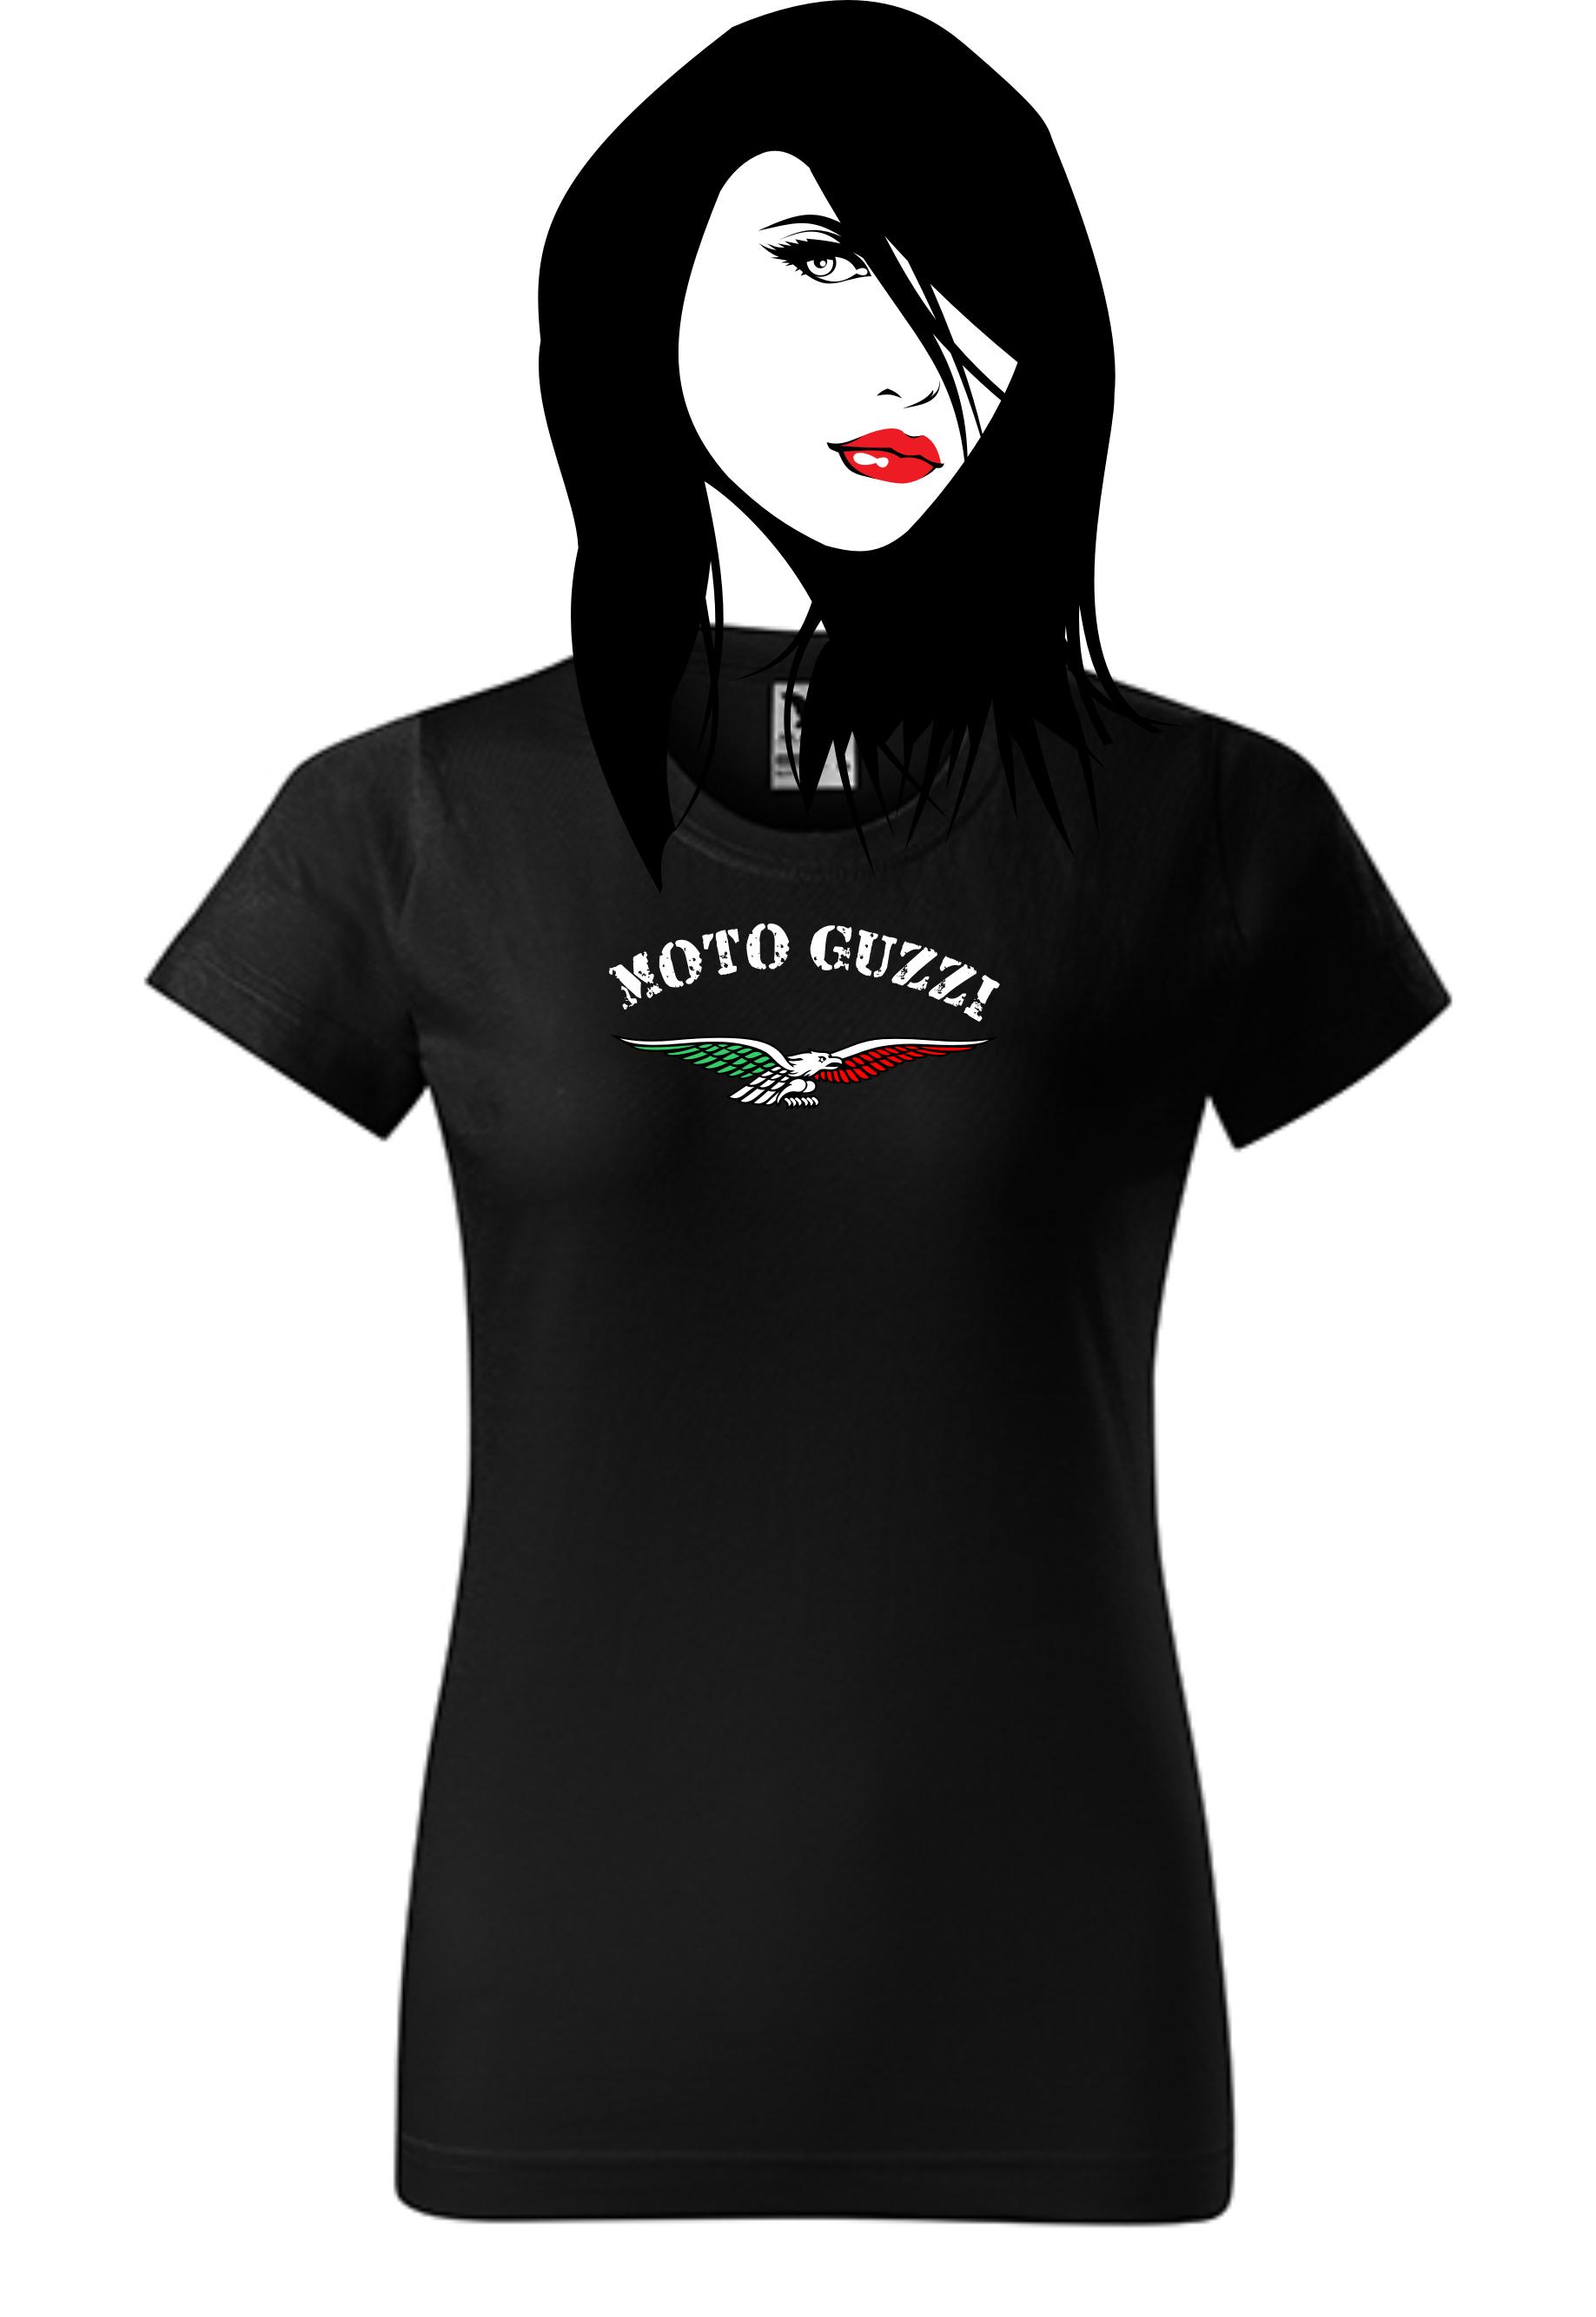 dd52cd4dbbc6 Dámské tričko s potiskem Moto Guzzi 1